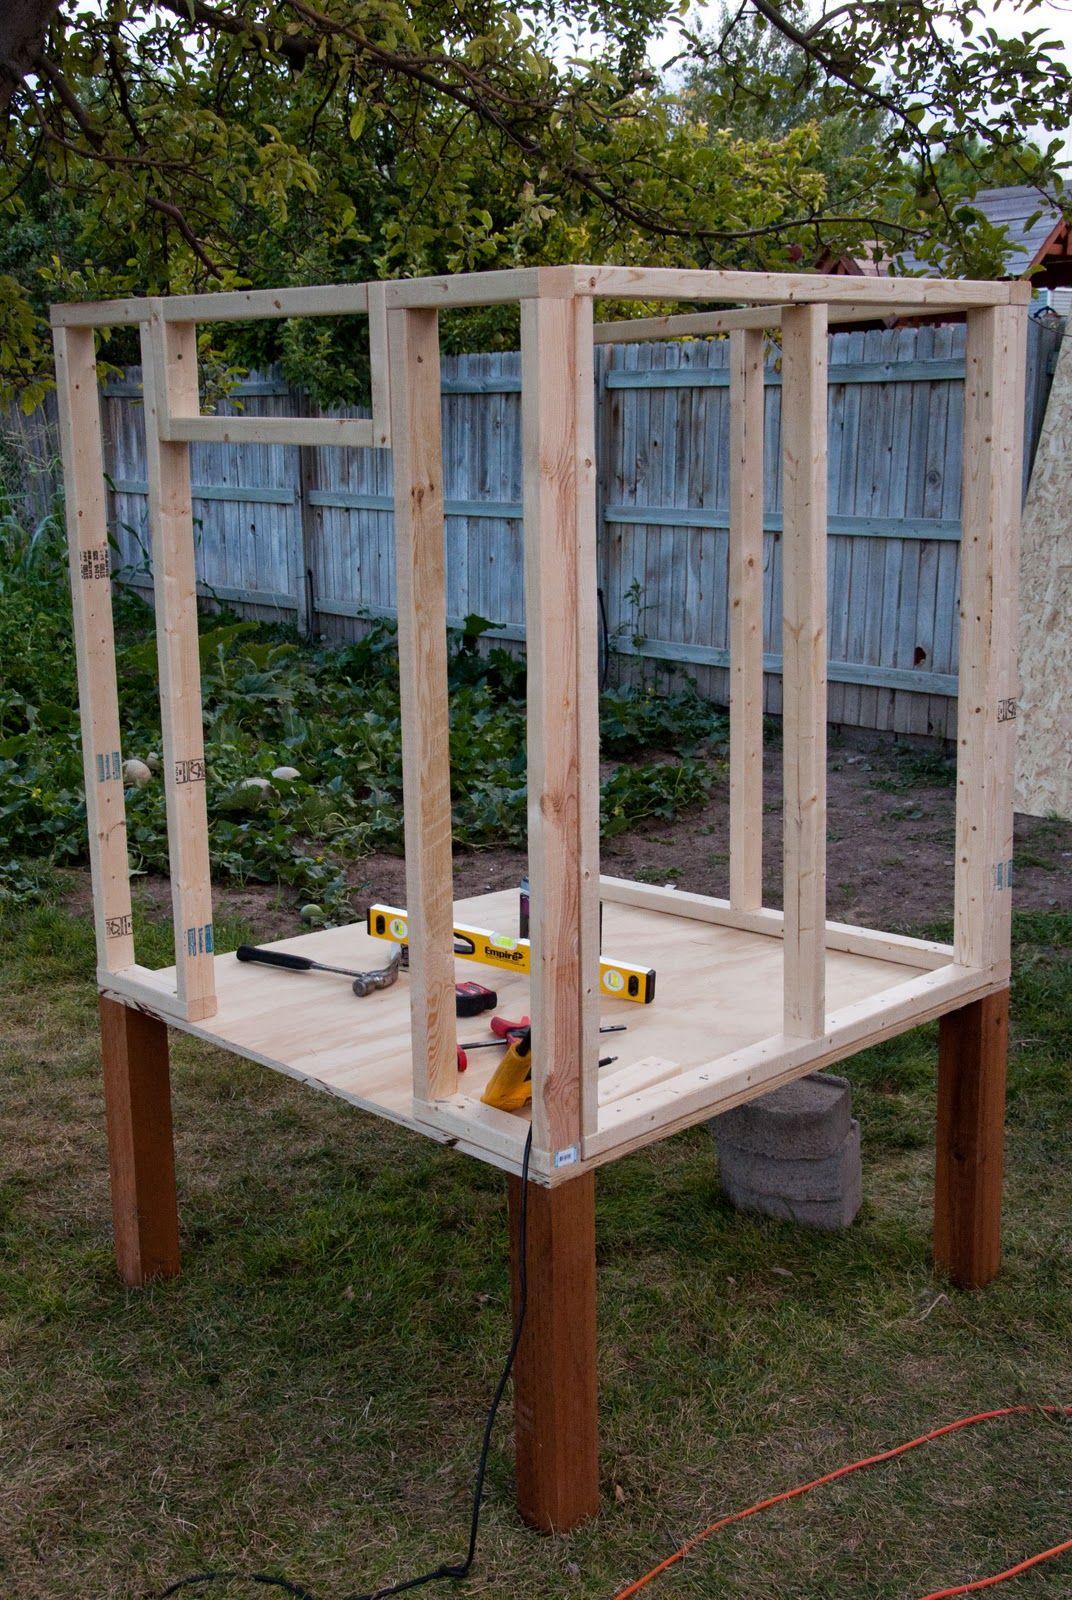 Backyard Chicken Coop Plans Backyard Chicken Coops: Chickens Backyard, Building A Chicken Coop, Best